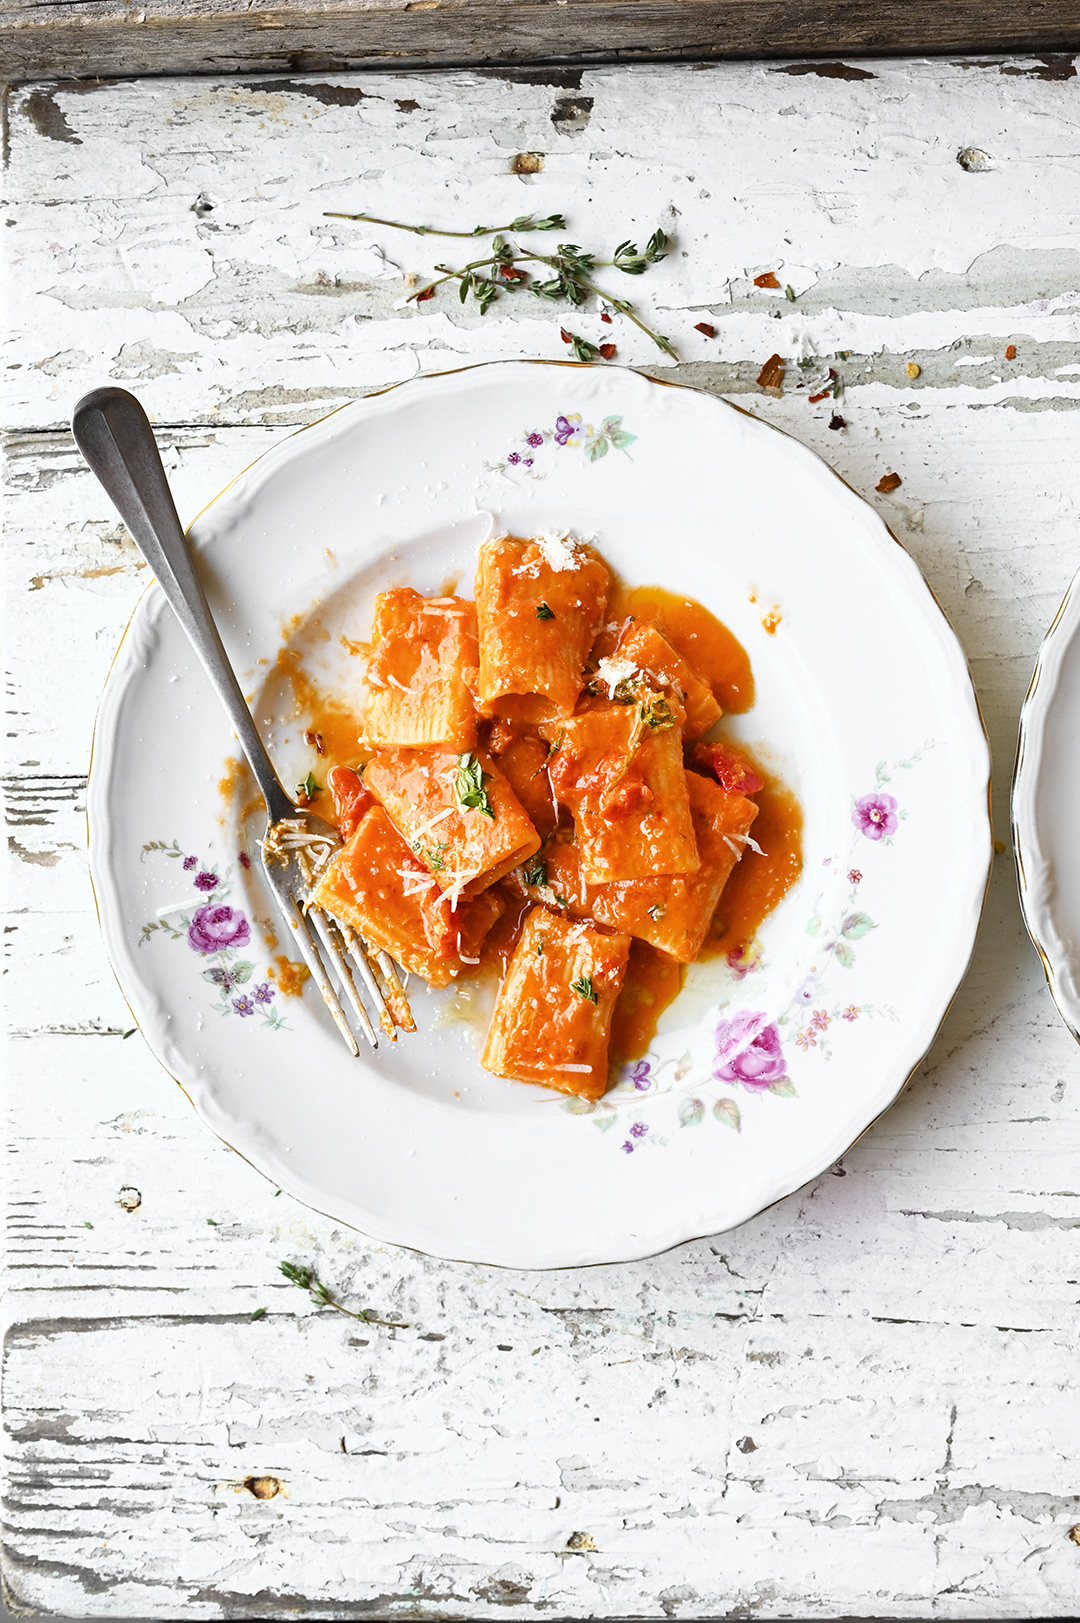 serving dumplings | Rigatoni z sosem pomidorowym alla vodka